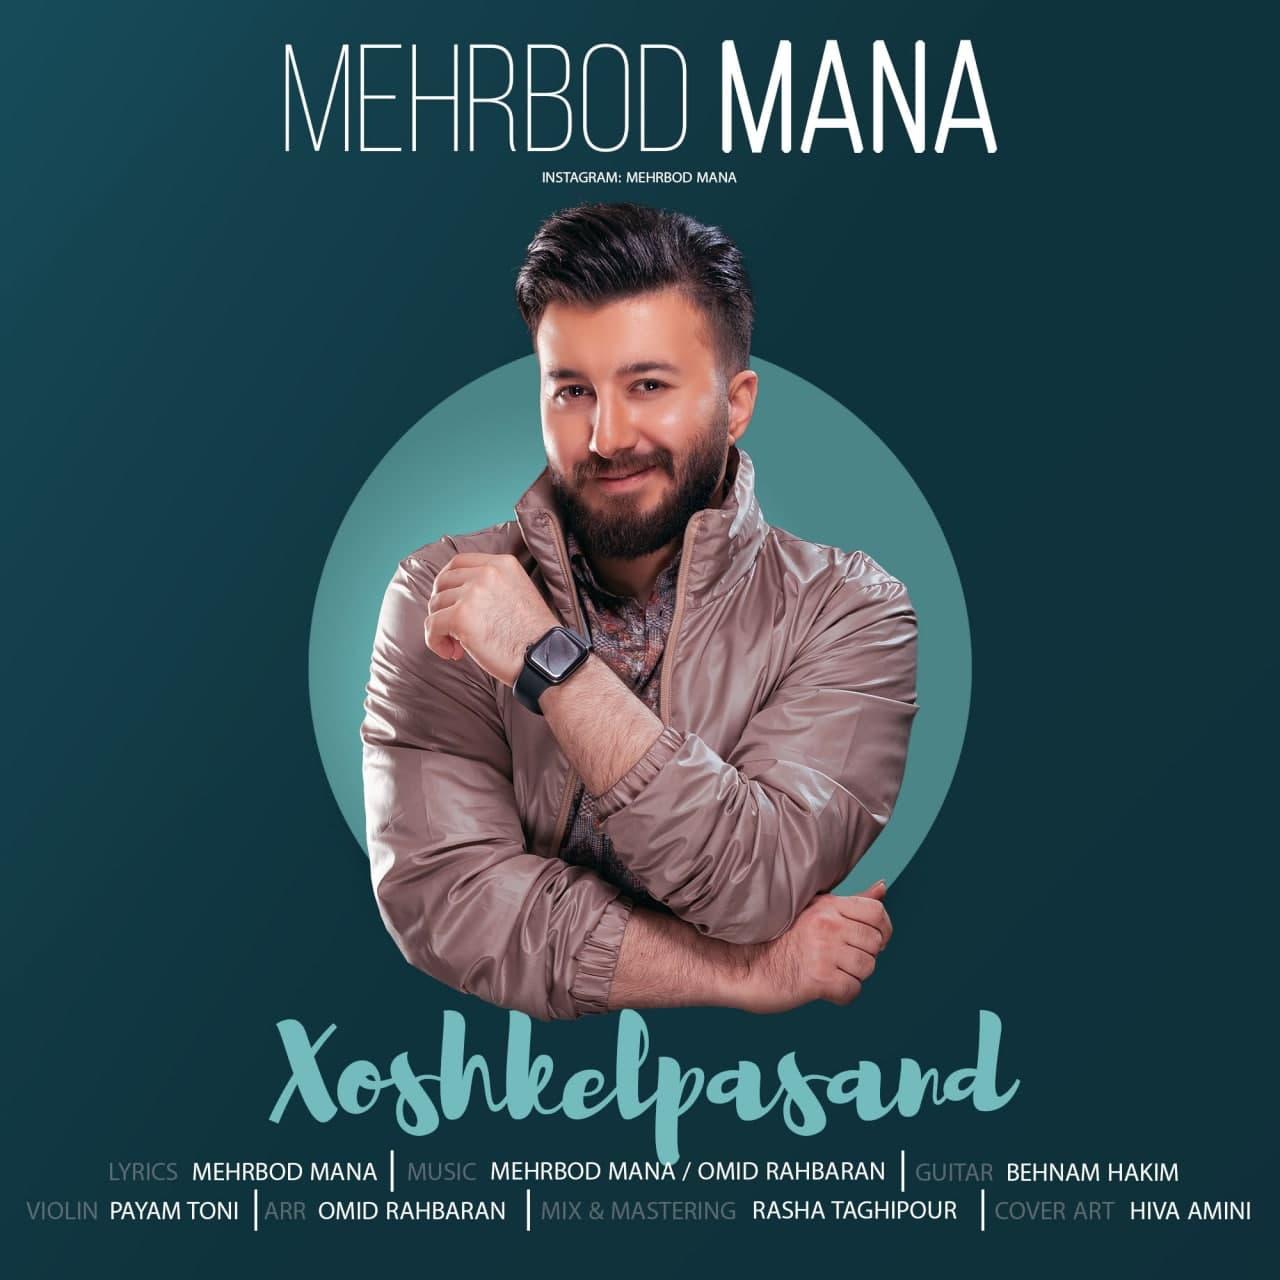 Download Ahang مهربد مانا خوشکل پسند